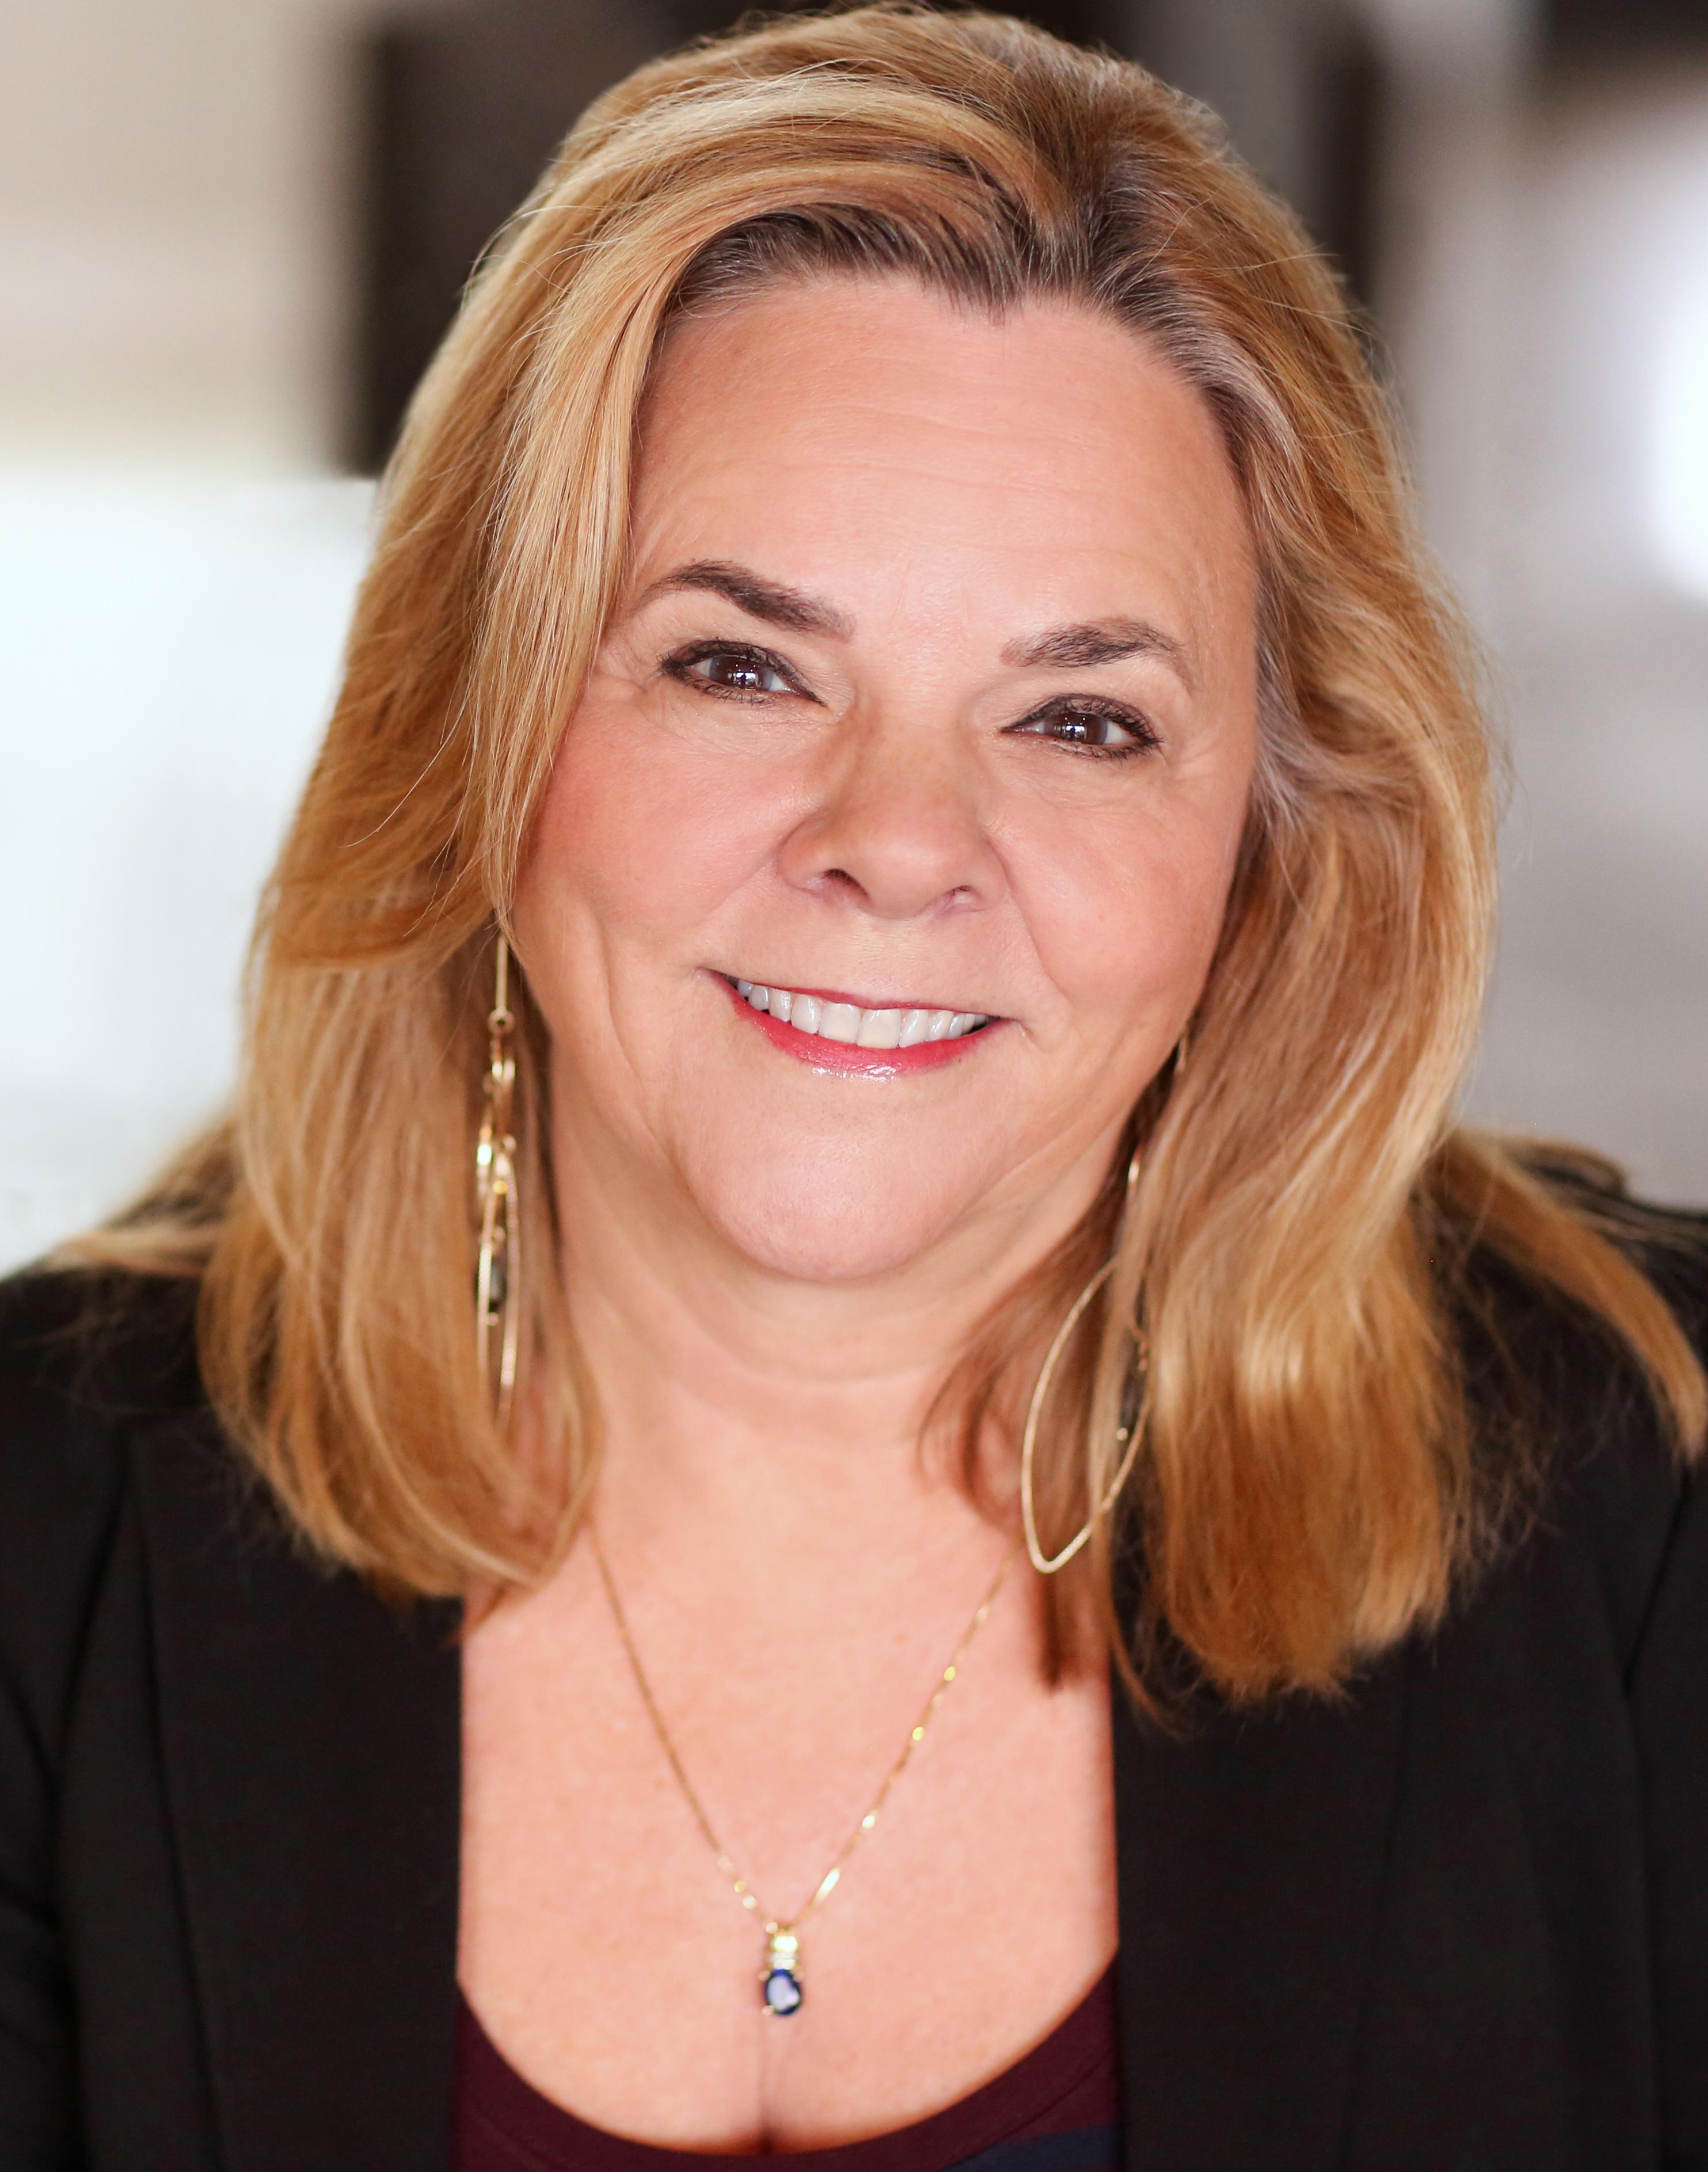 Kathy Ripps